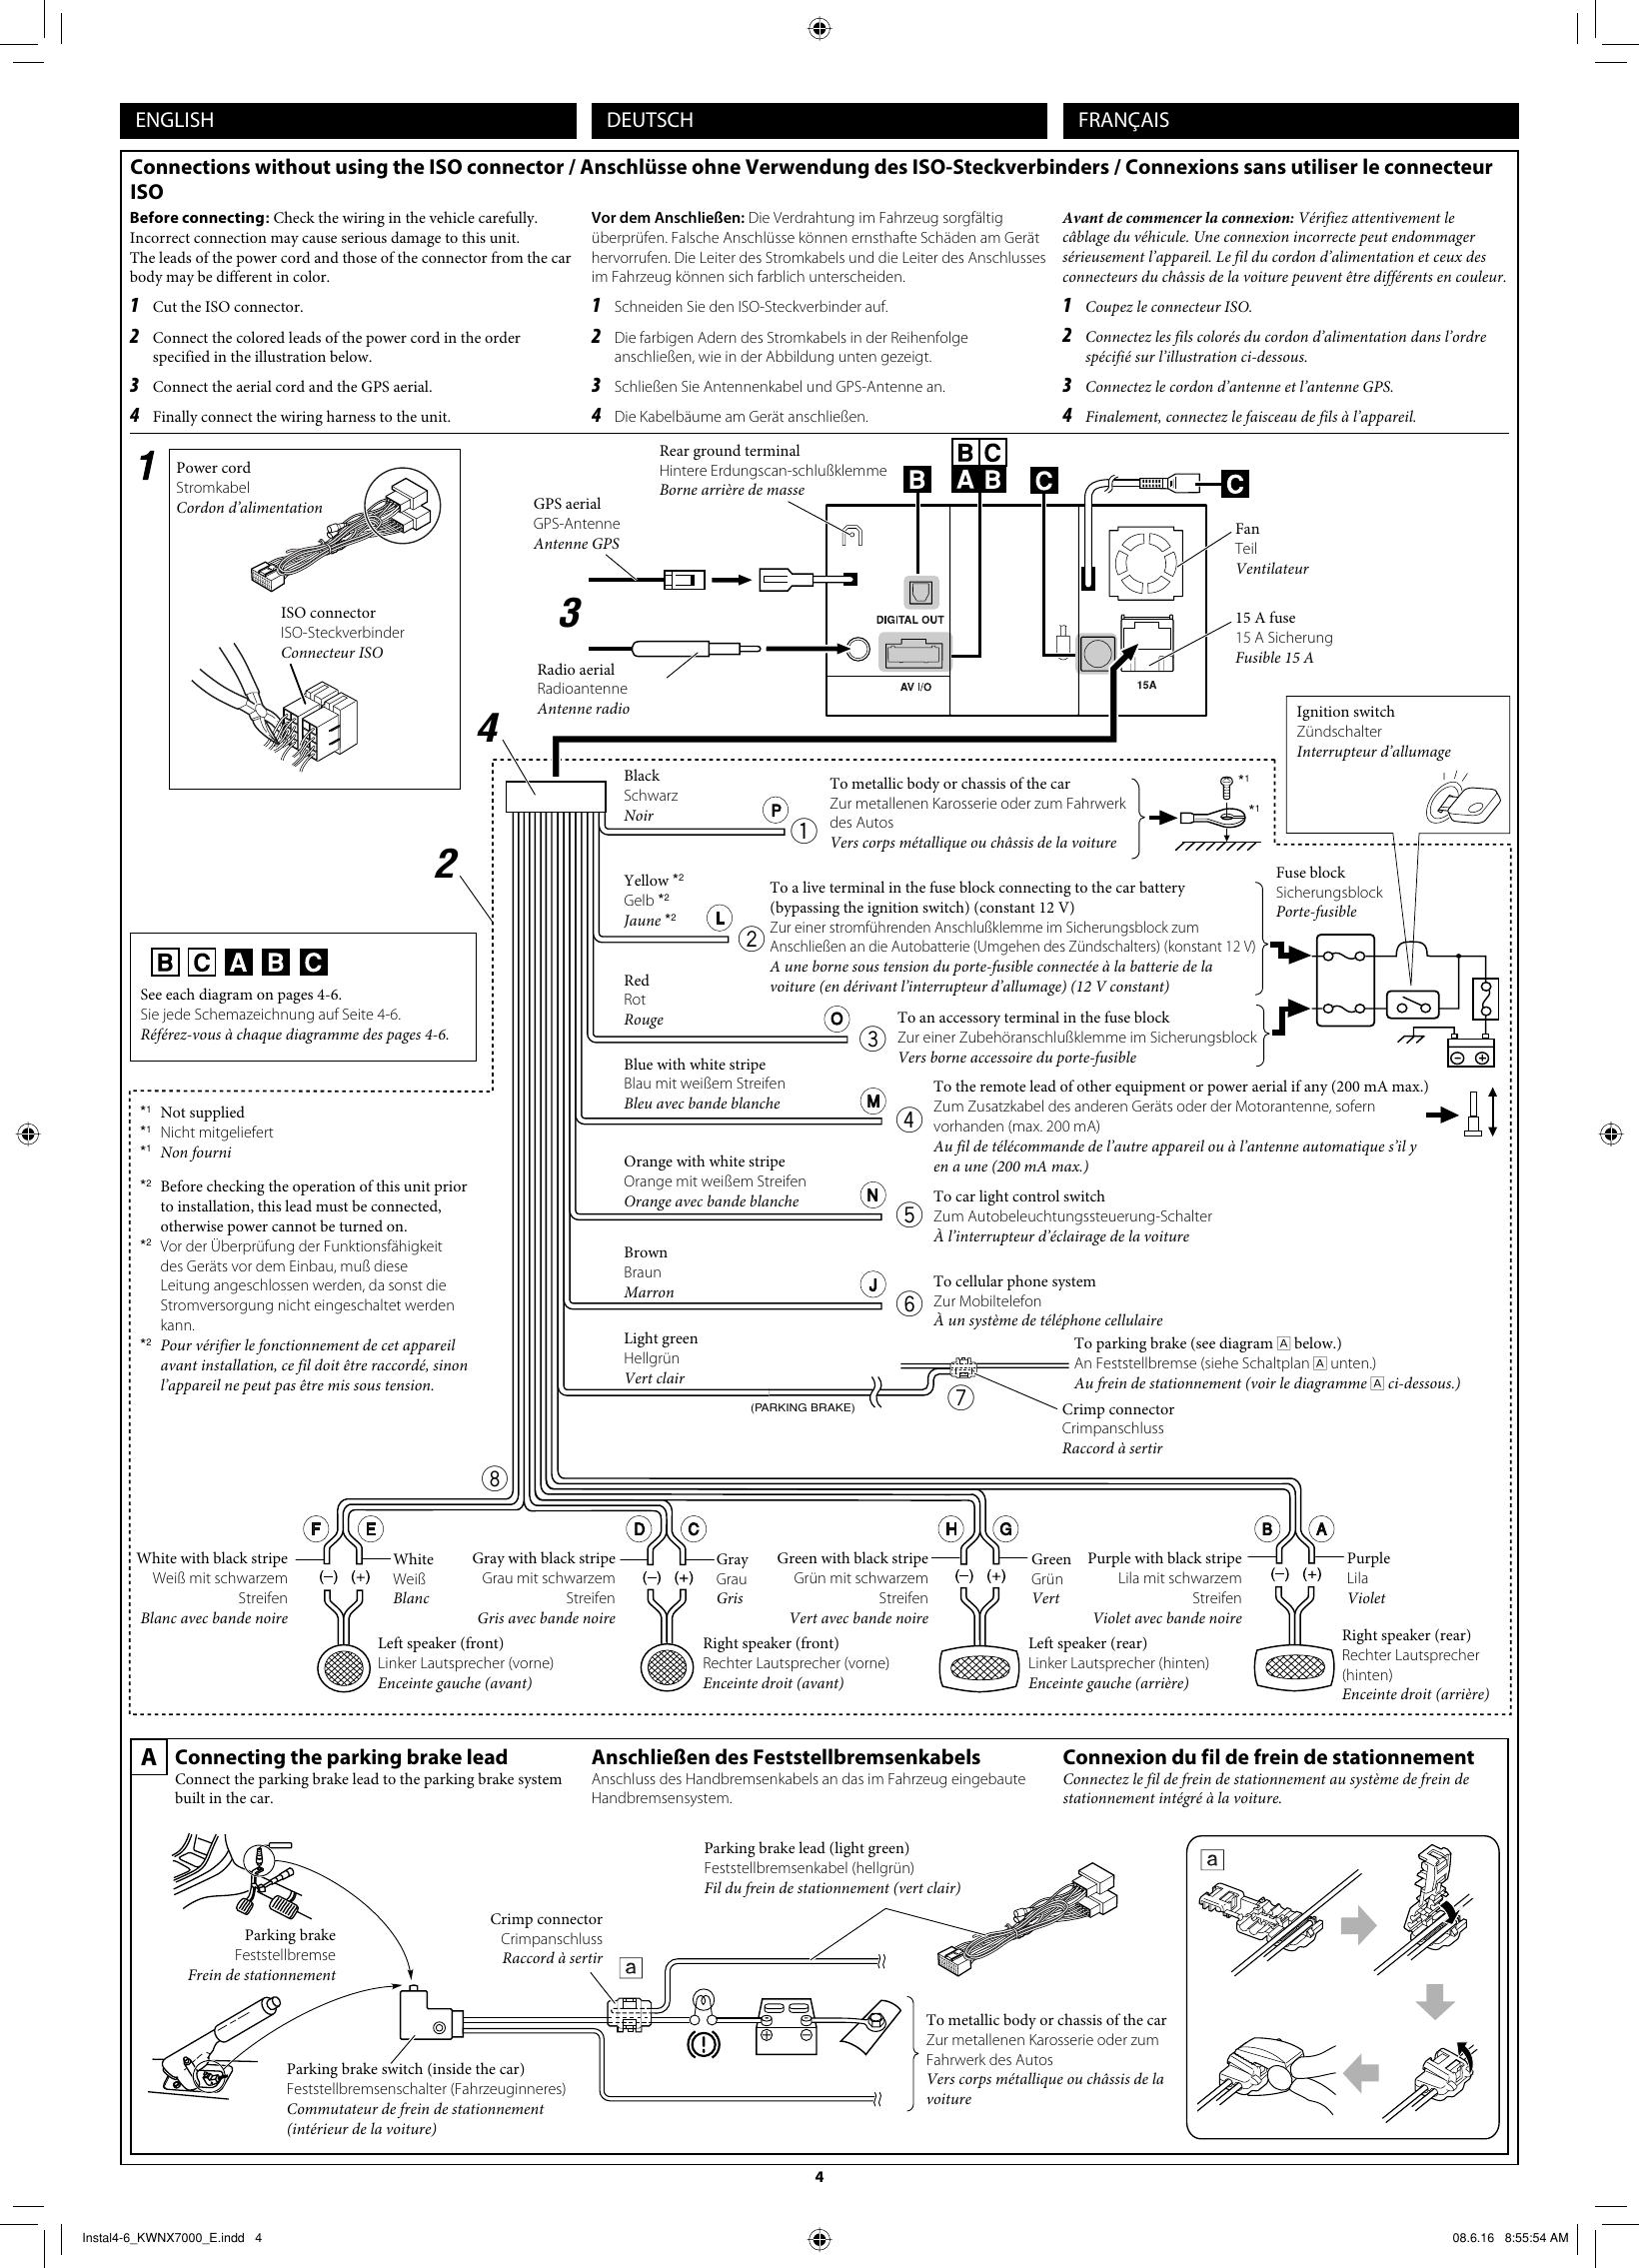 JVC KW NX7000E NX7000 Installation User Manual LVT1839 004A Kw Wiring Diagram on pa wiring diagram, ge wiring diagram, ac wiring diagram, gm wiring diagram, sd wiring diagram, mg wiring diagram, st wiring diagram, jp wiring diagram, tj wiring diagram, hp wiring diagram, ag wiring diagram, td wiring diagram, ml wiring diagram, cm wiring diagram, sh wiring diagram, dj wiring diagram, ae wiring diagram, cr wiring diagram, sg wiring diagram, tv wiring diagram,